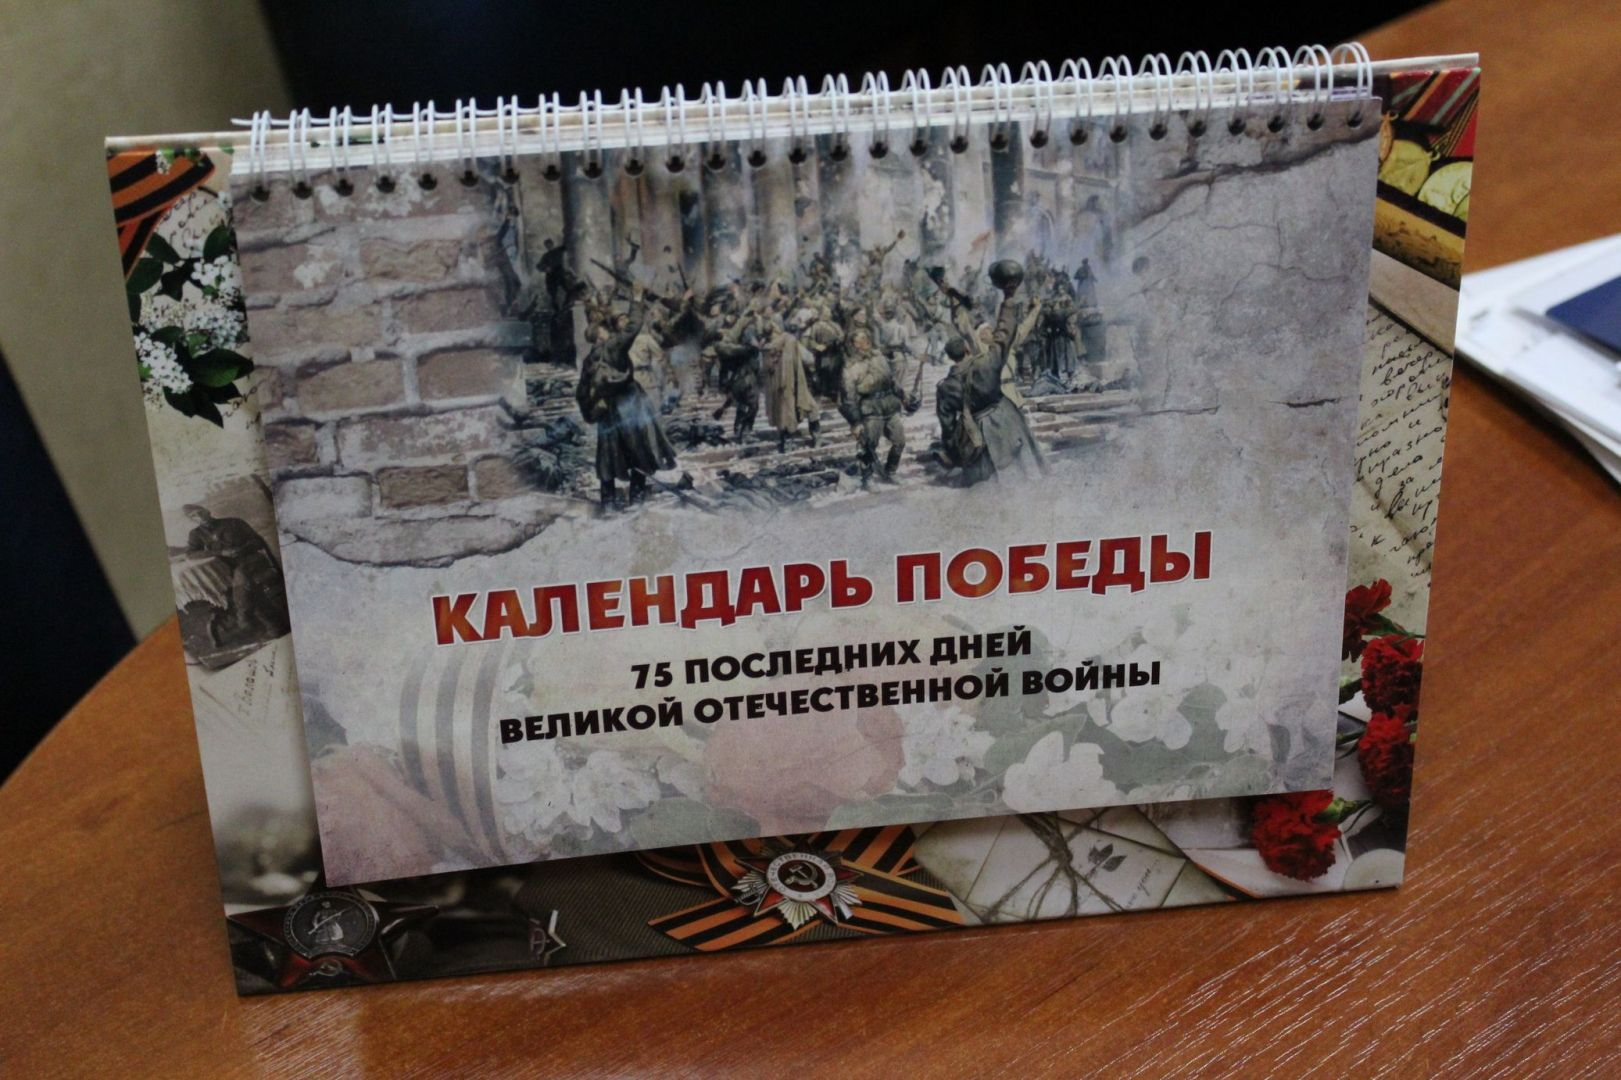 Издание библиотеки - календарь Победы